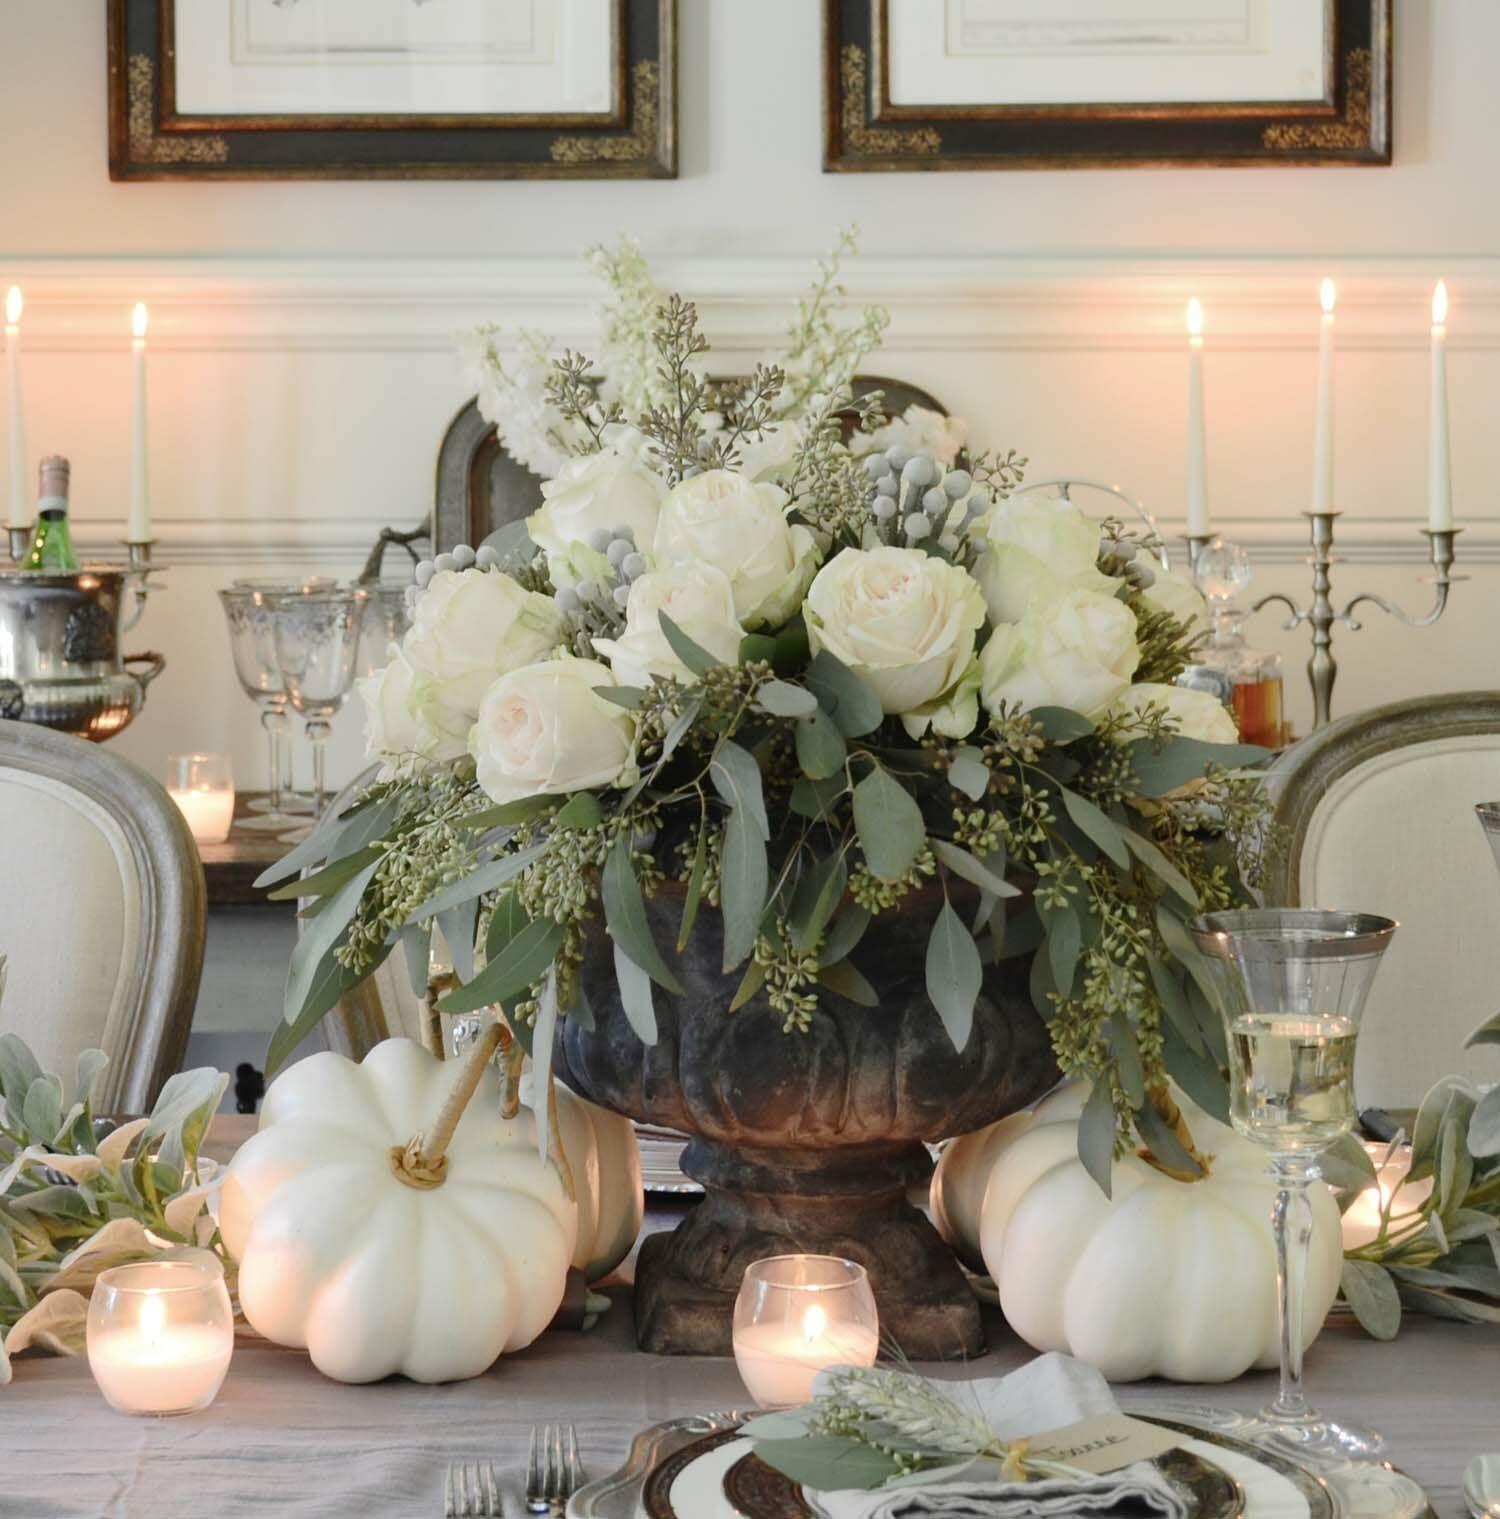 Elegant Fall Table Arrangements: 25+ Beautiful And Elegant Centerpiece Ideas For A